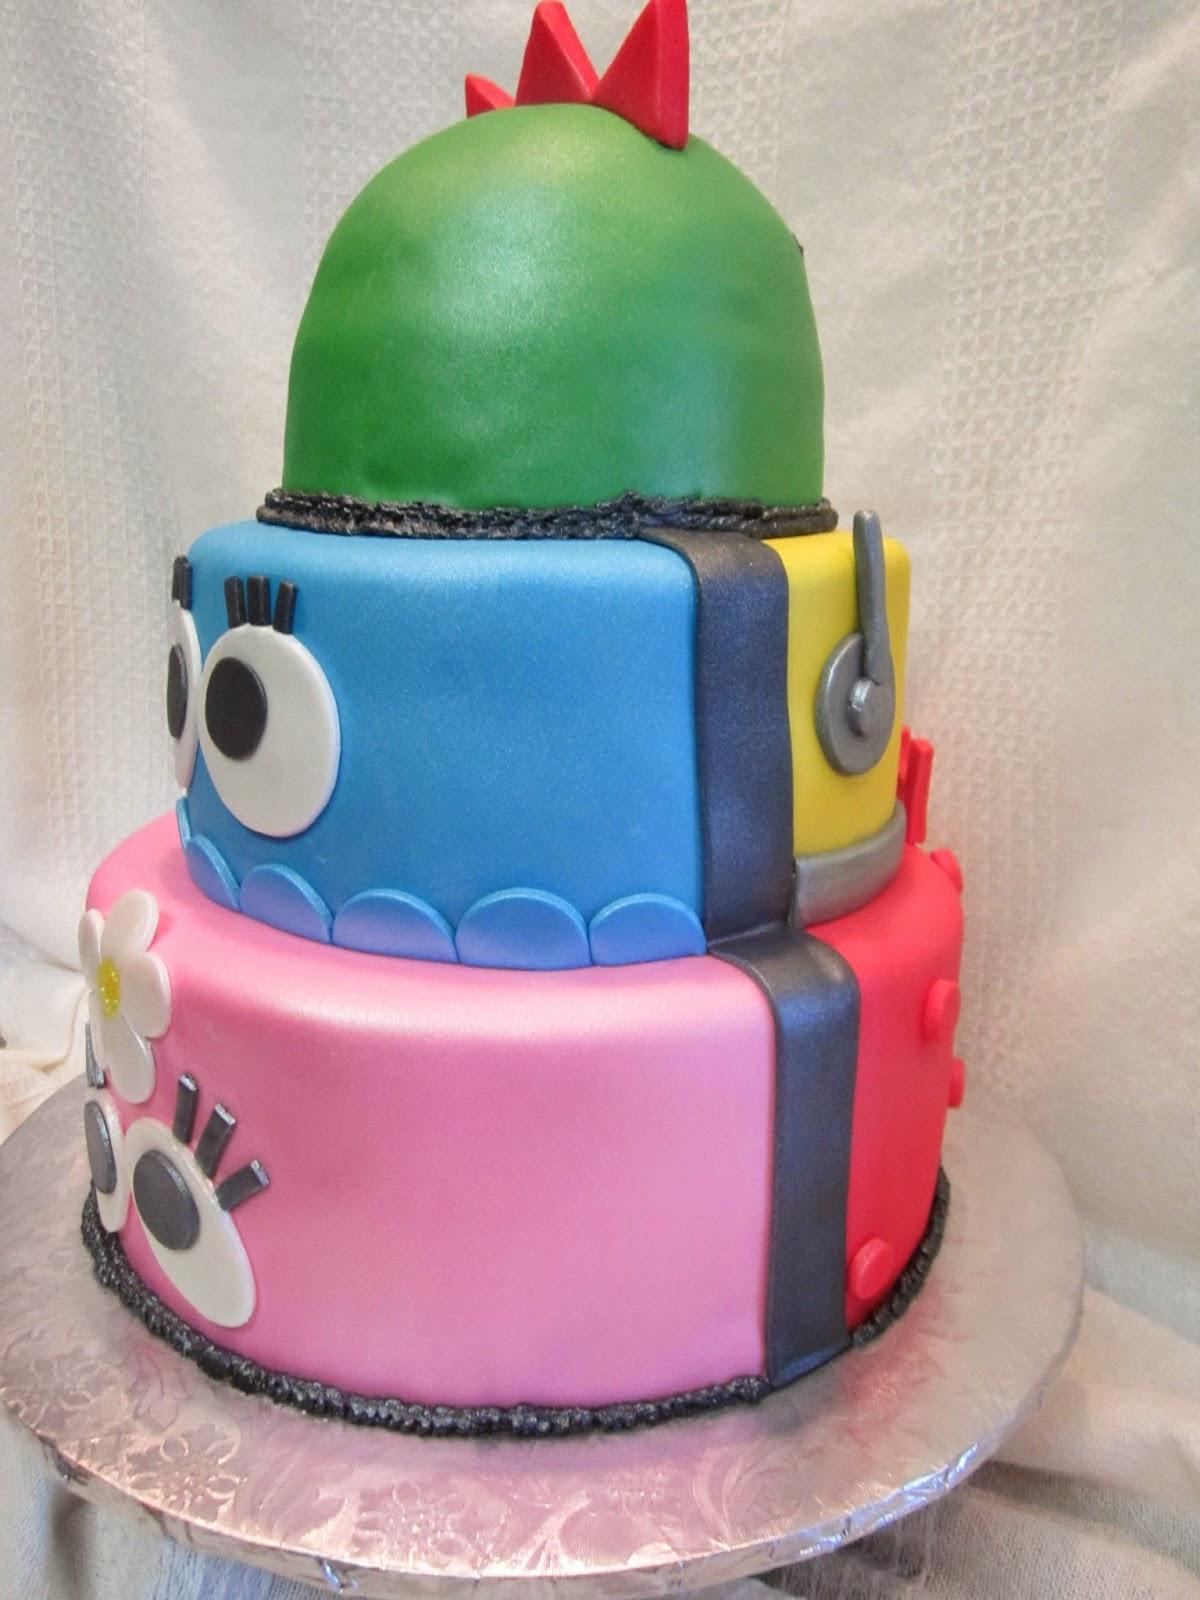 Mymonicakes Yo Gabba Gabba Cake With Gumpaste Boom Box